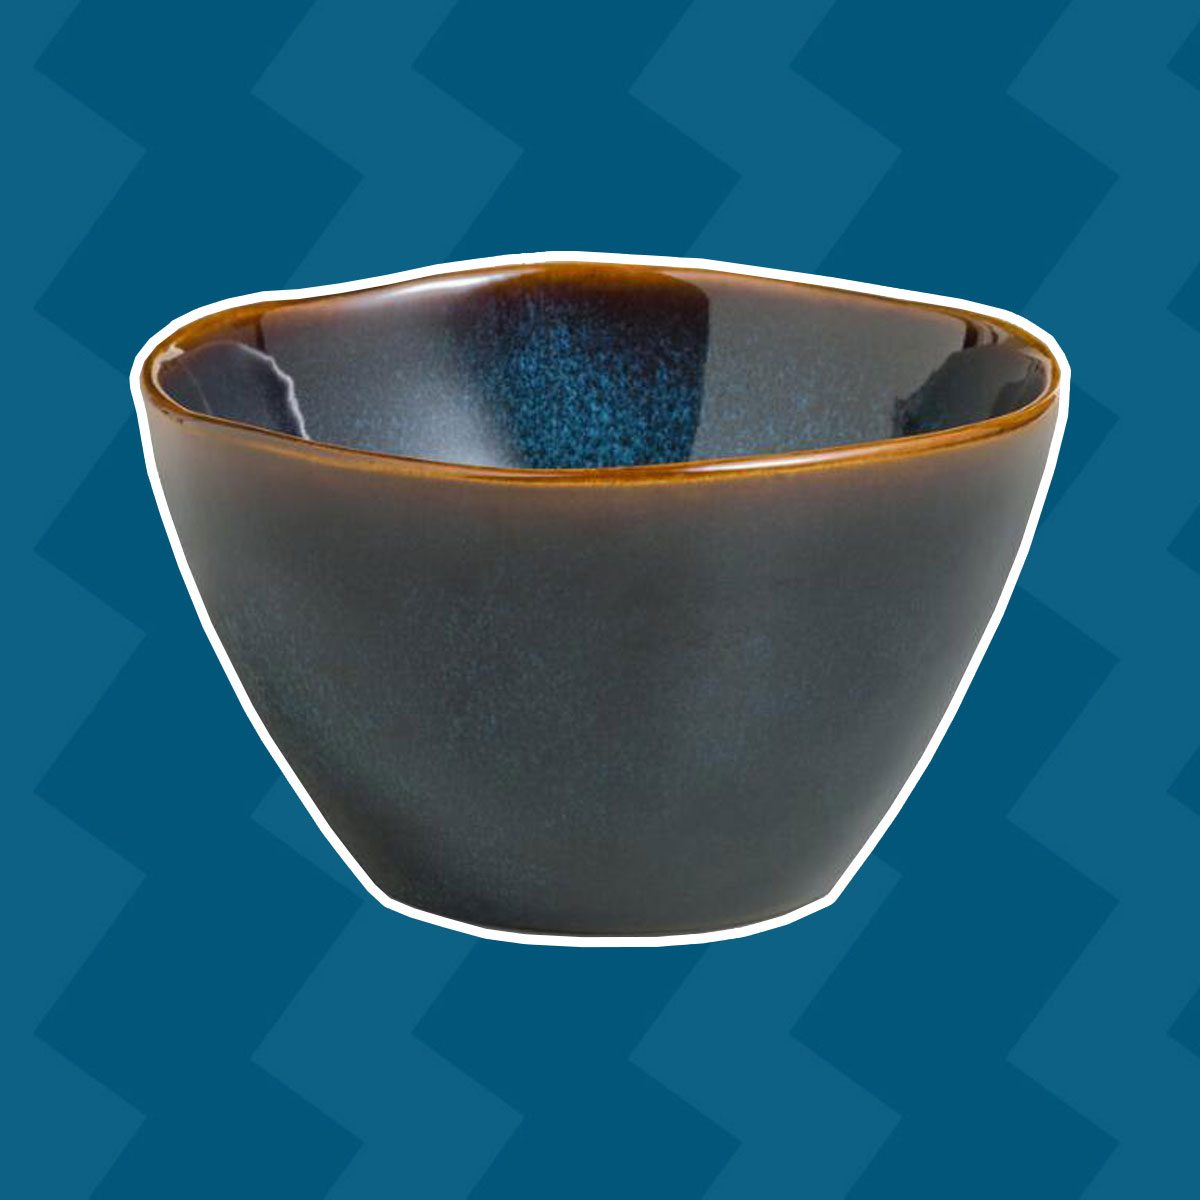 Indigo Organic Reactive Glaze Bowls, Set Of 2